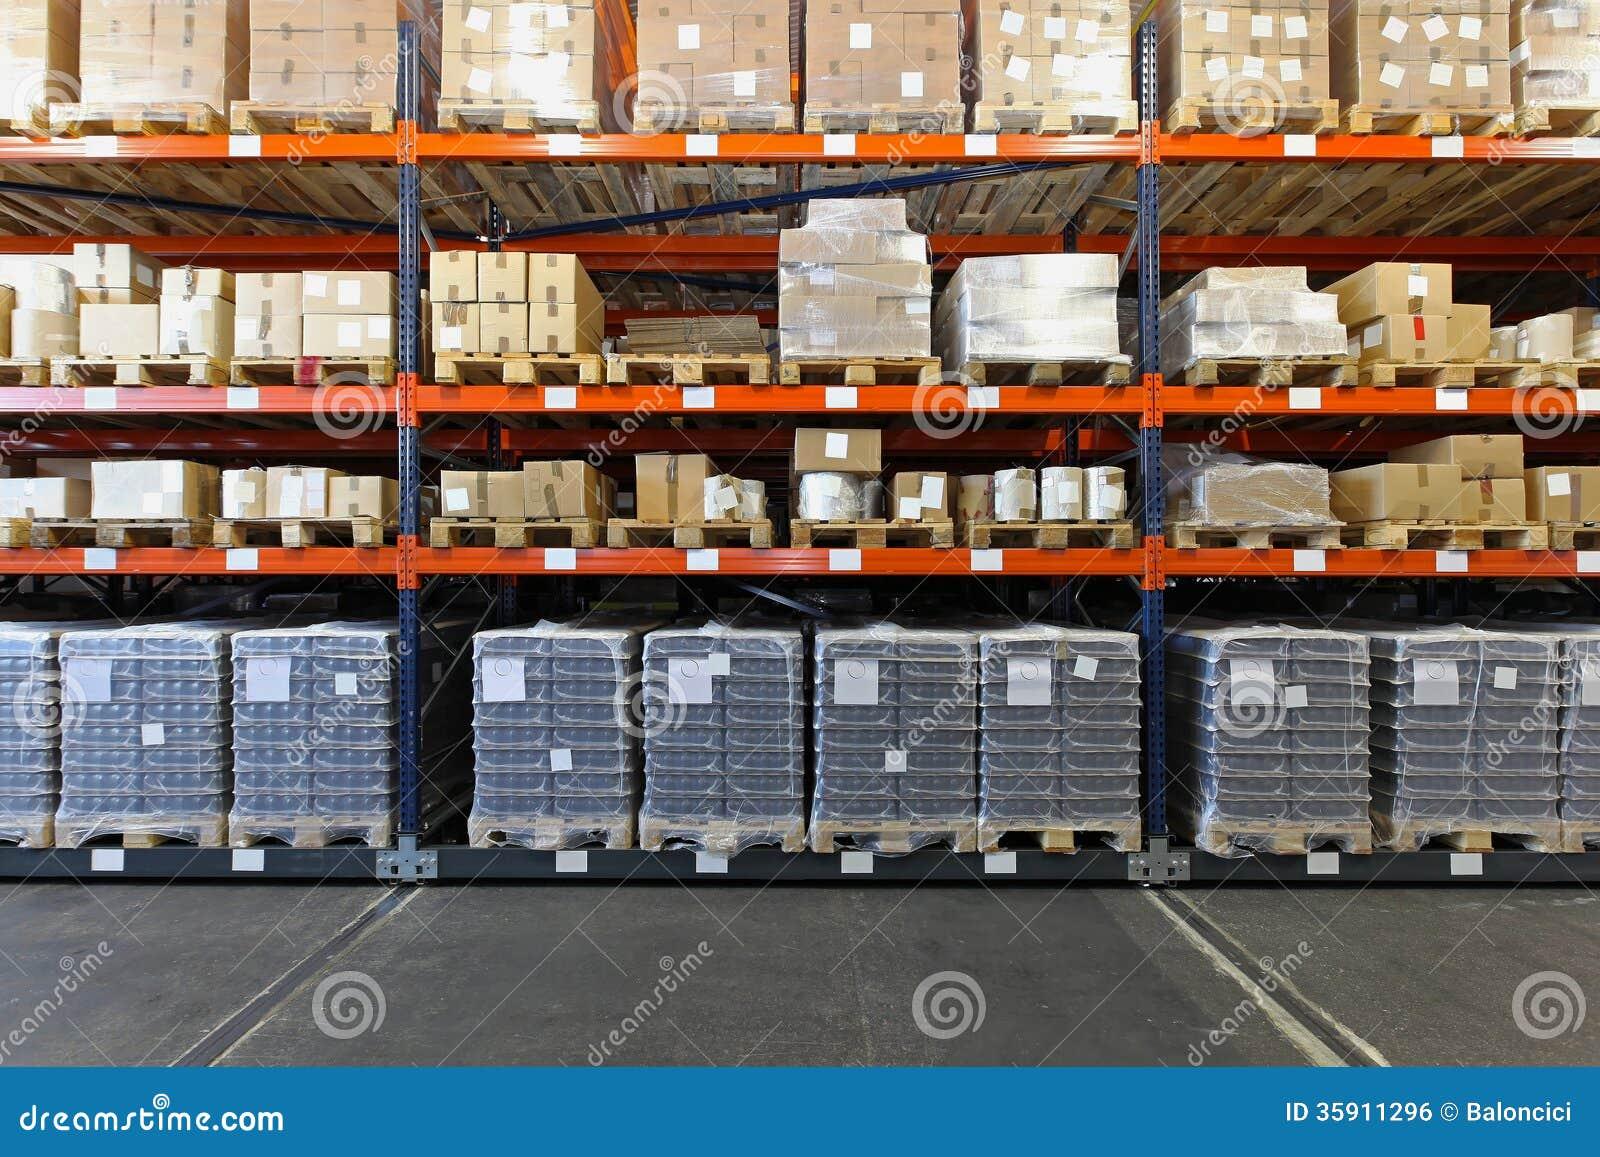 Shelves And Racks Stock Photo Image Of Merchandise